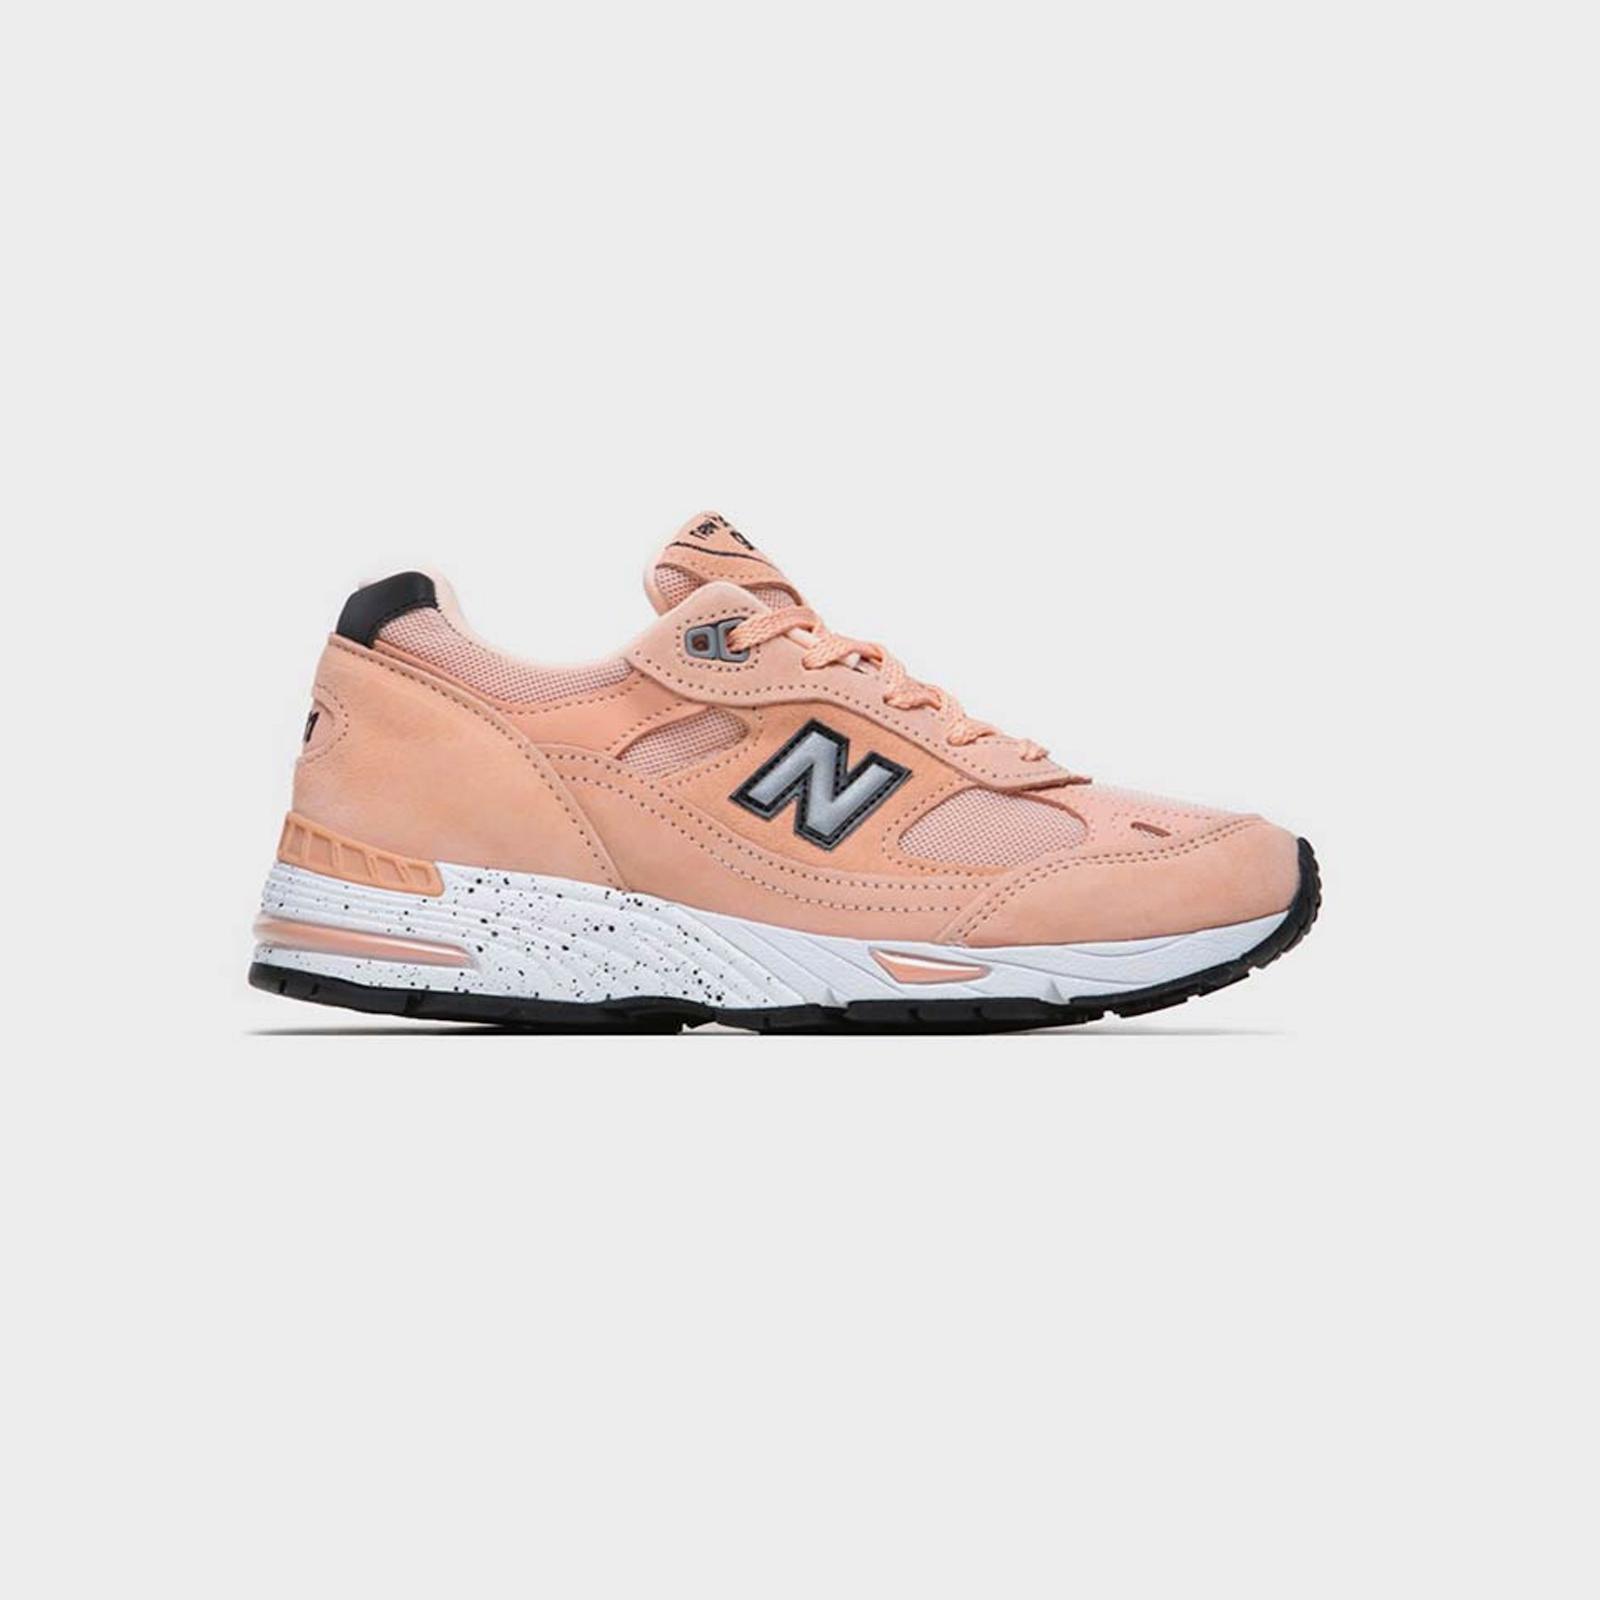 New Balance W991 X Naked - W991nps - Sneakersnstuff